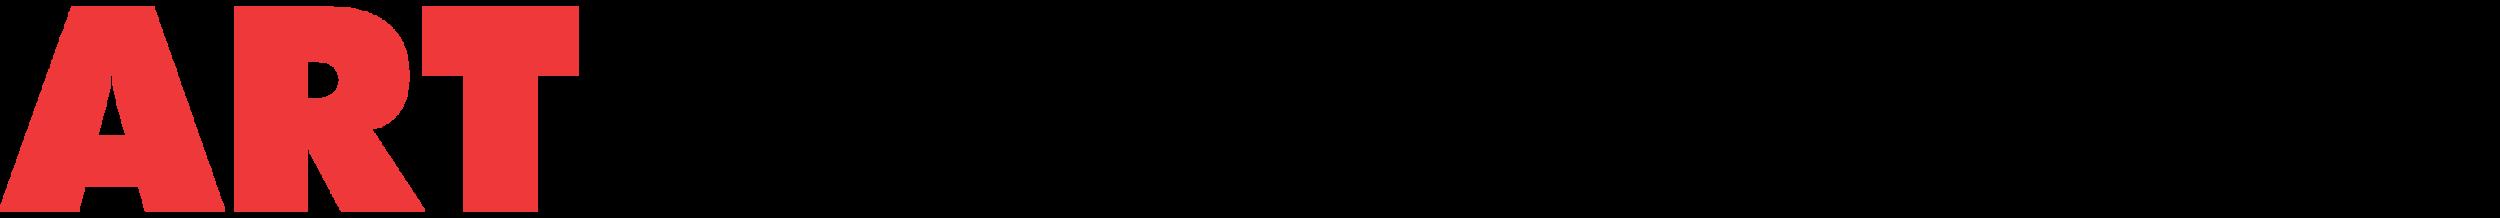 ANP-Logo-01_media.png